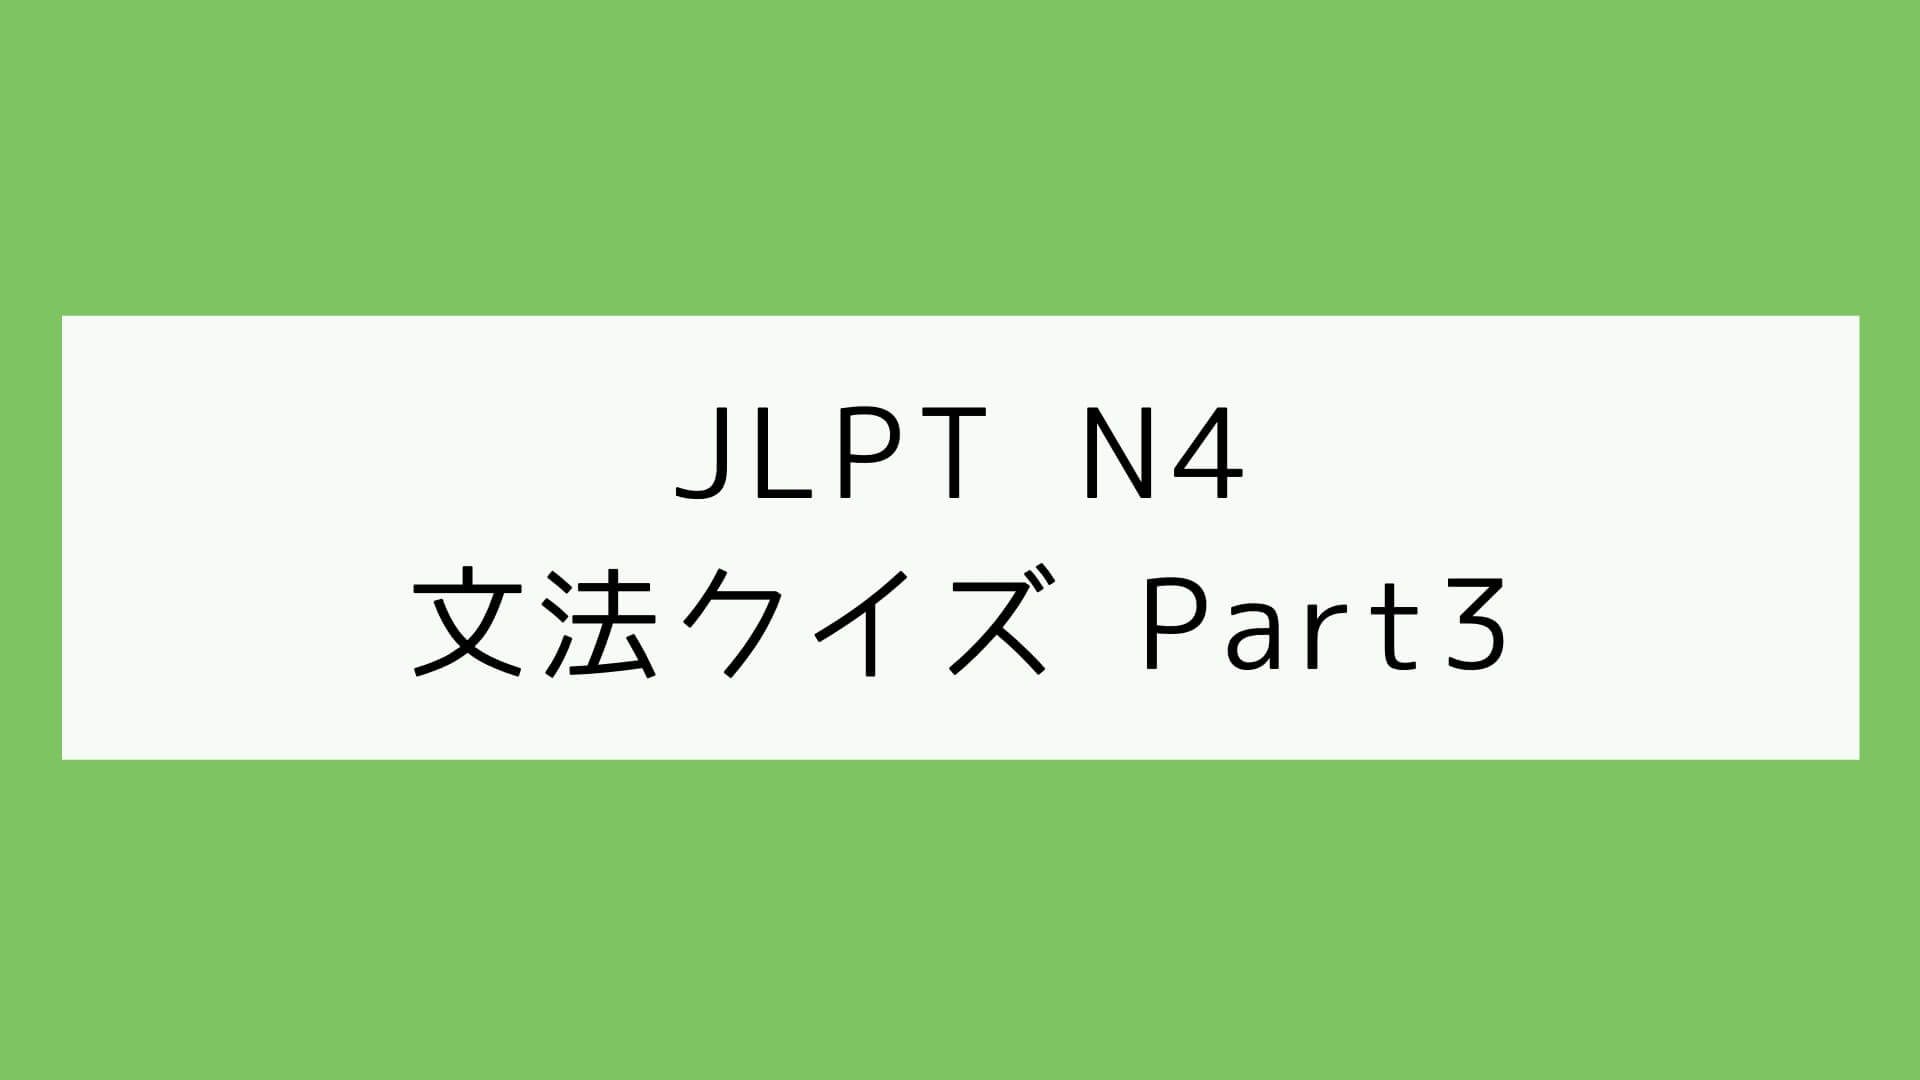 【JLPT N4】文法クイズ Part3